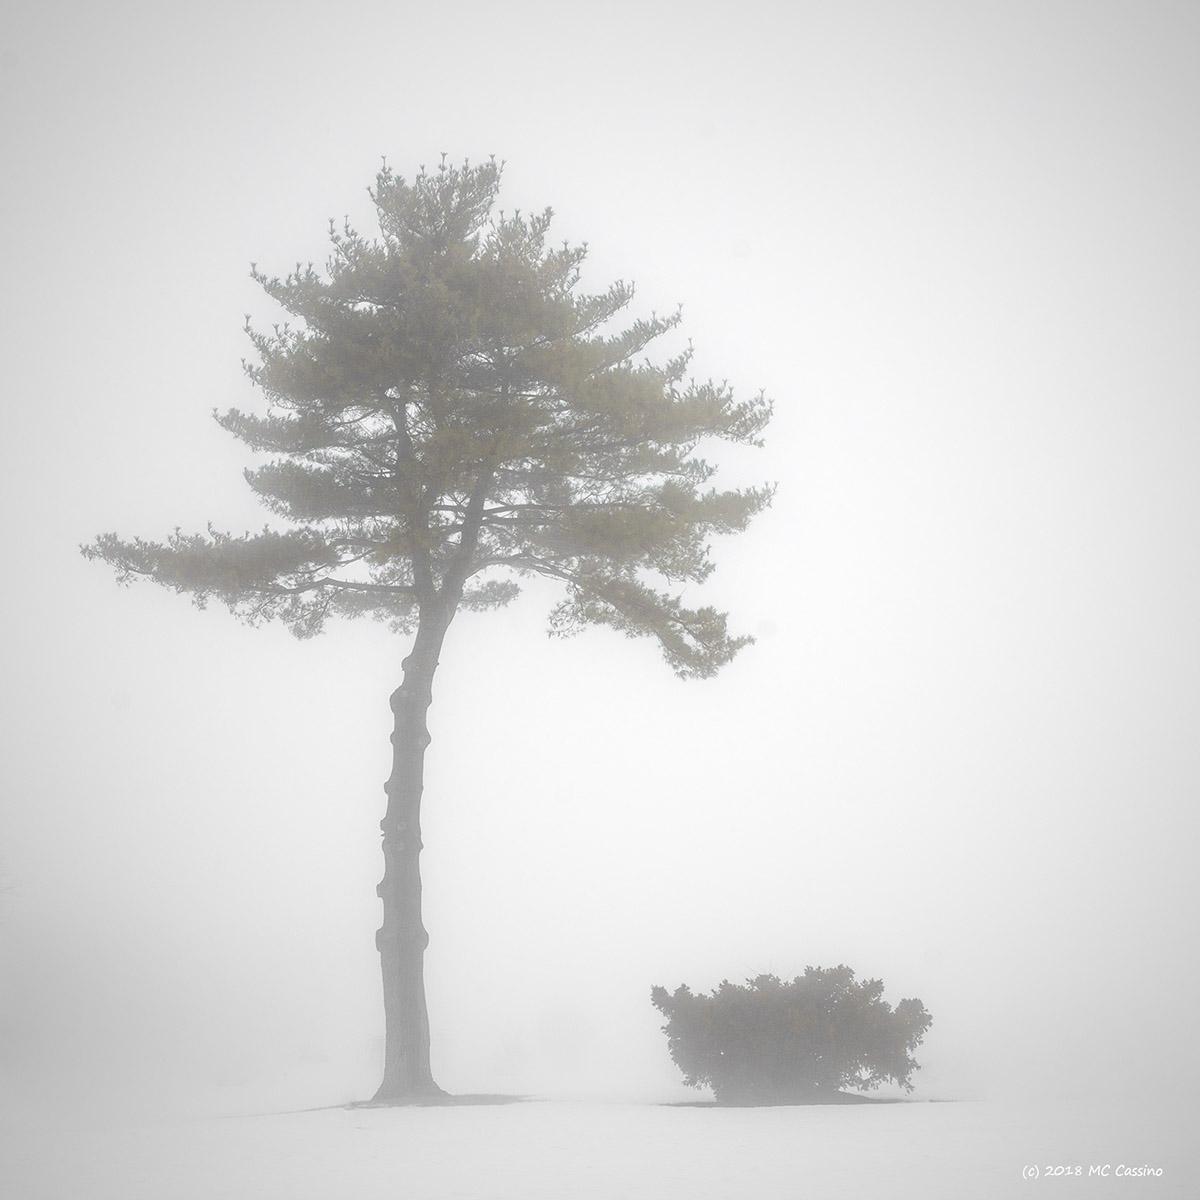 Tree and Shrub